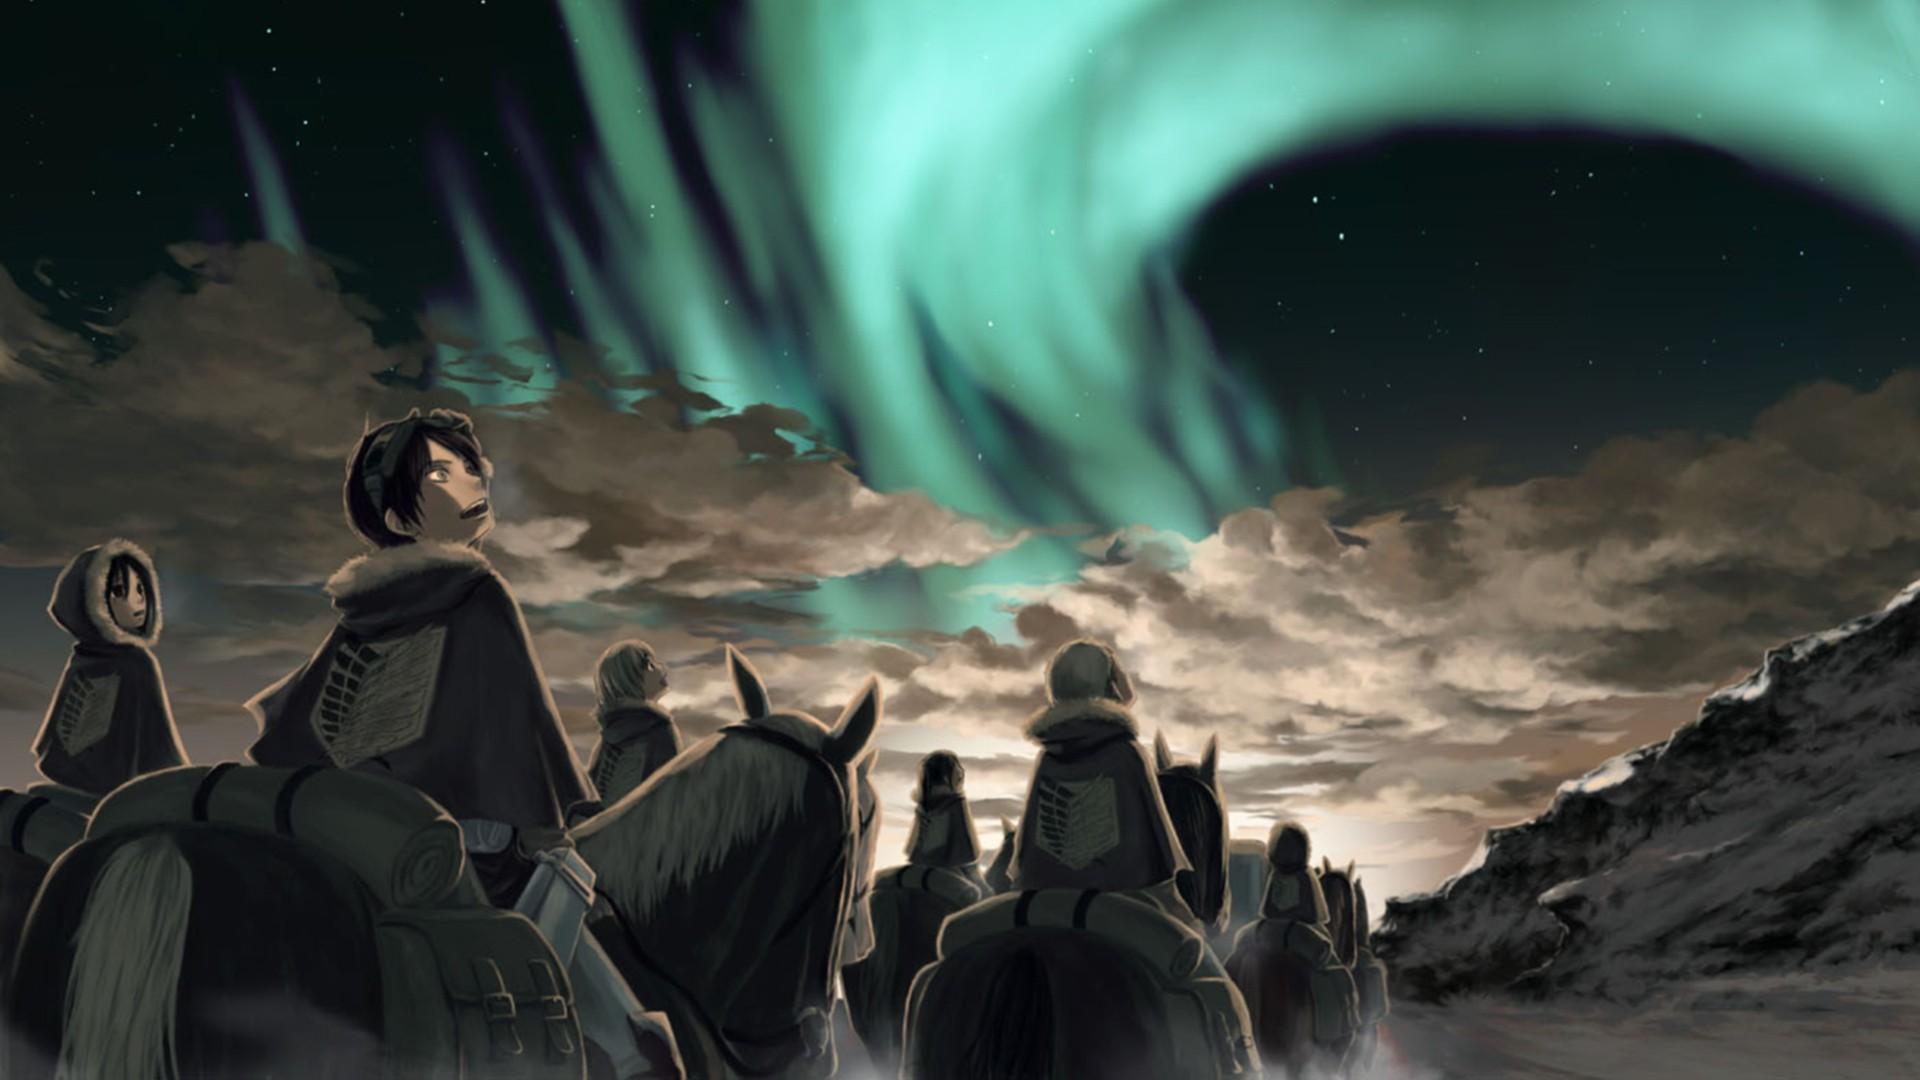 Wallpaper Attack On Titans Anime Shingeki No Kyojin 1920x1080 Blackwater 1861355 Hd Wallpapers Wallhere